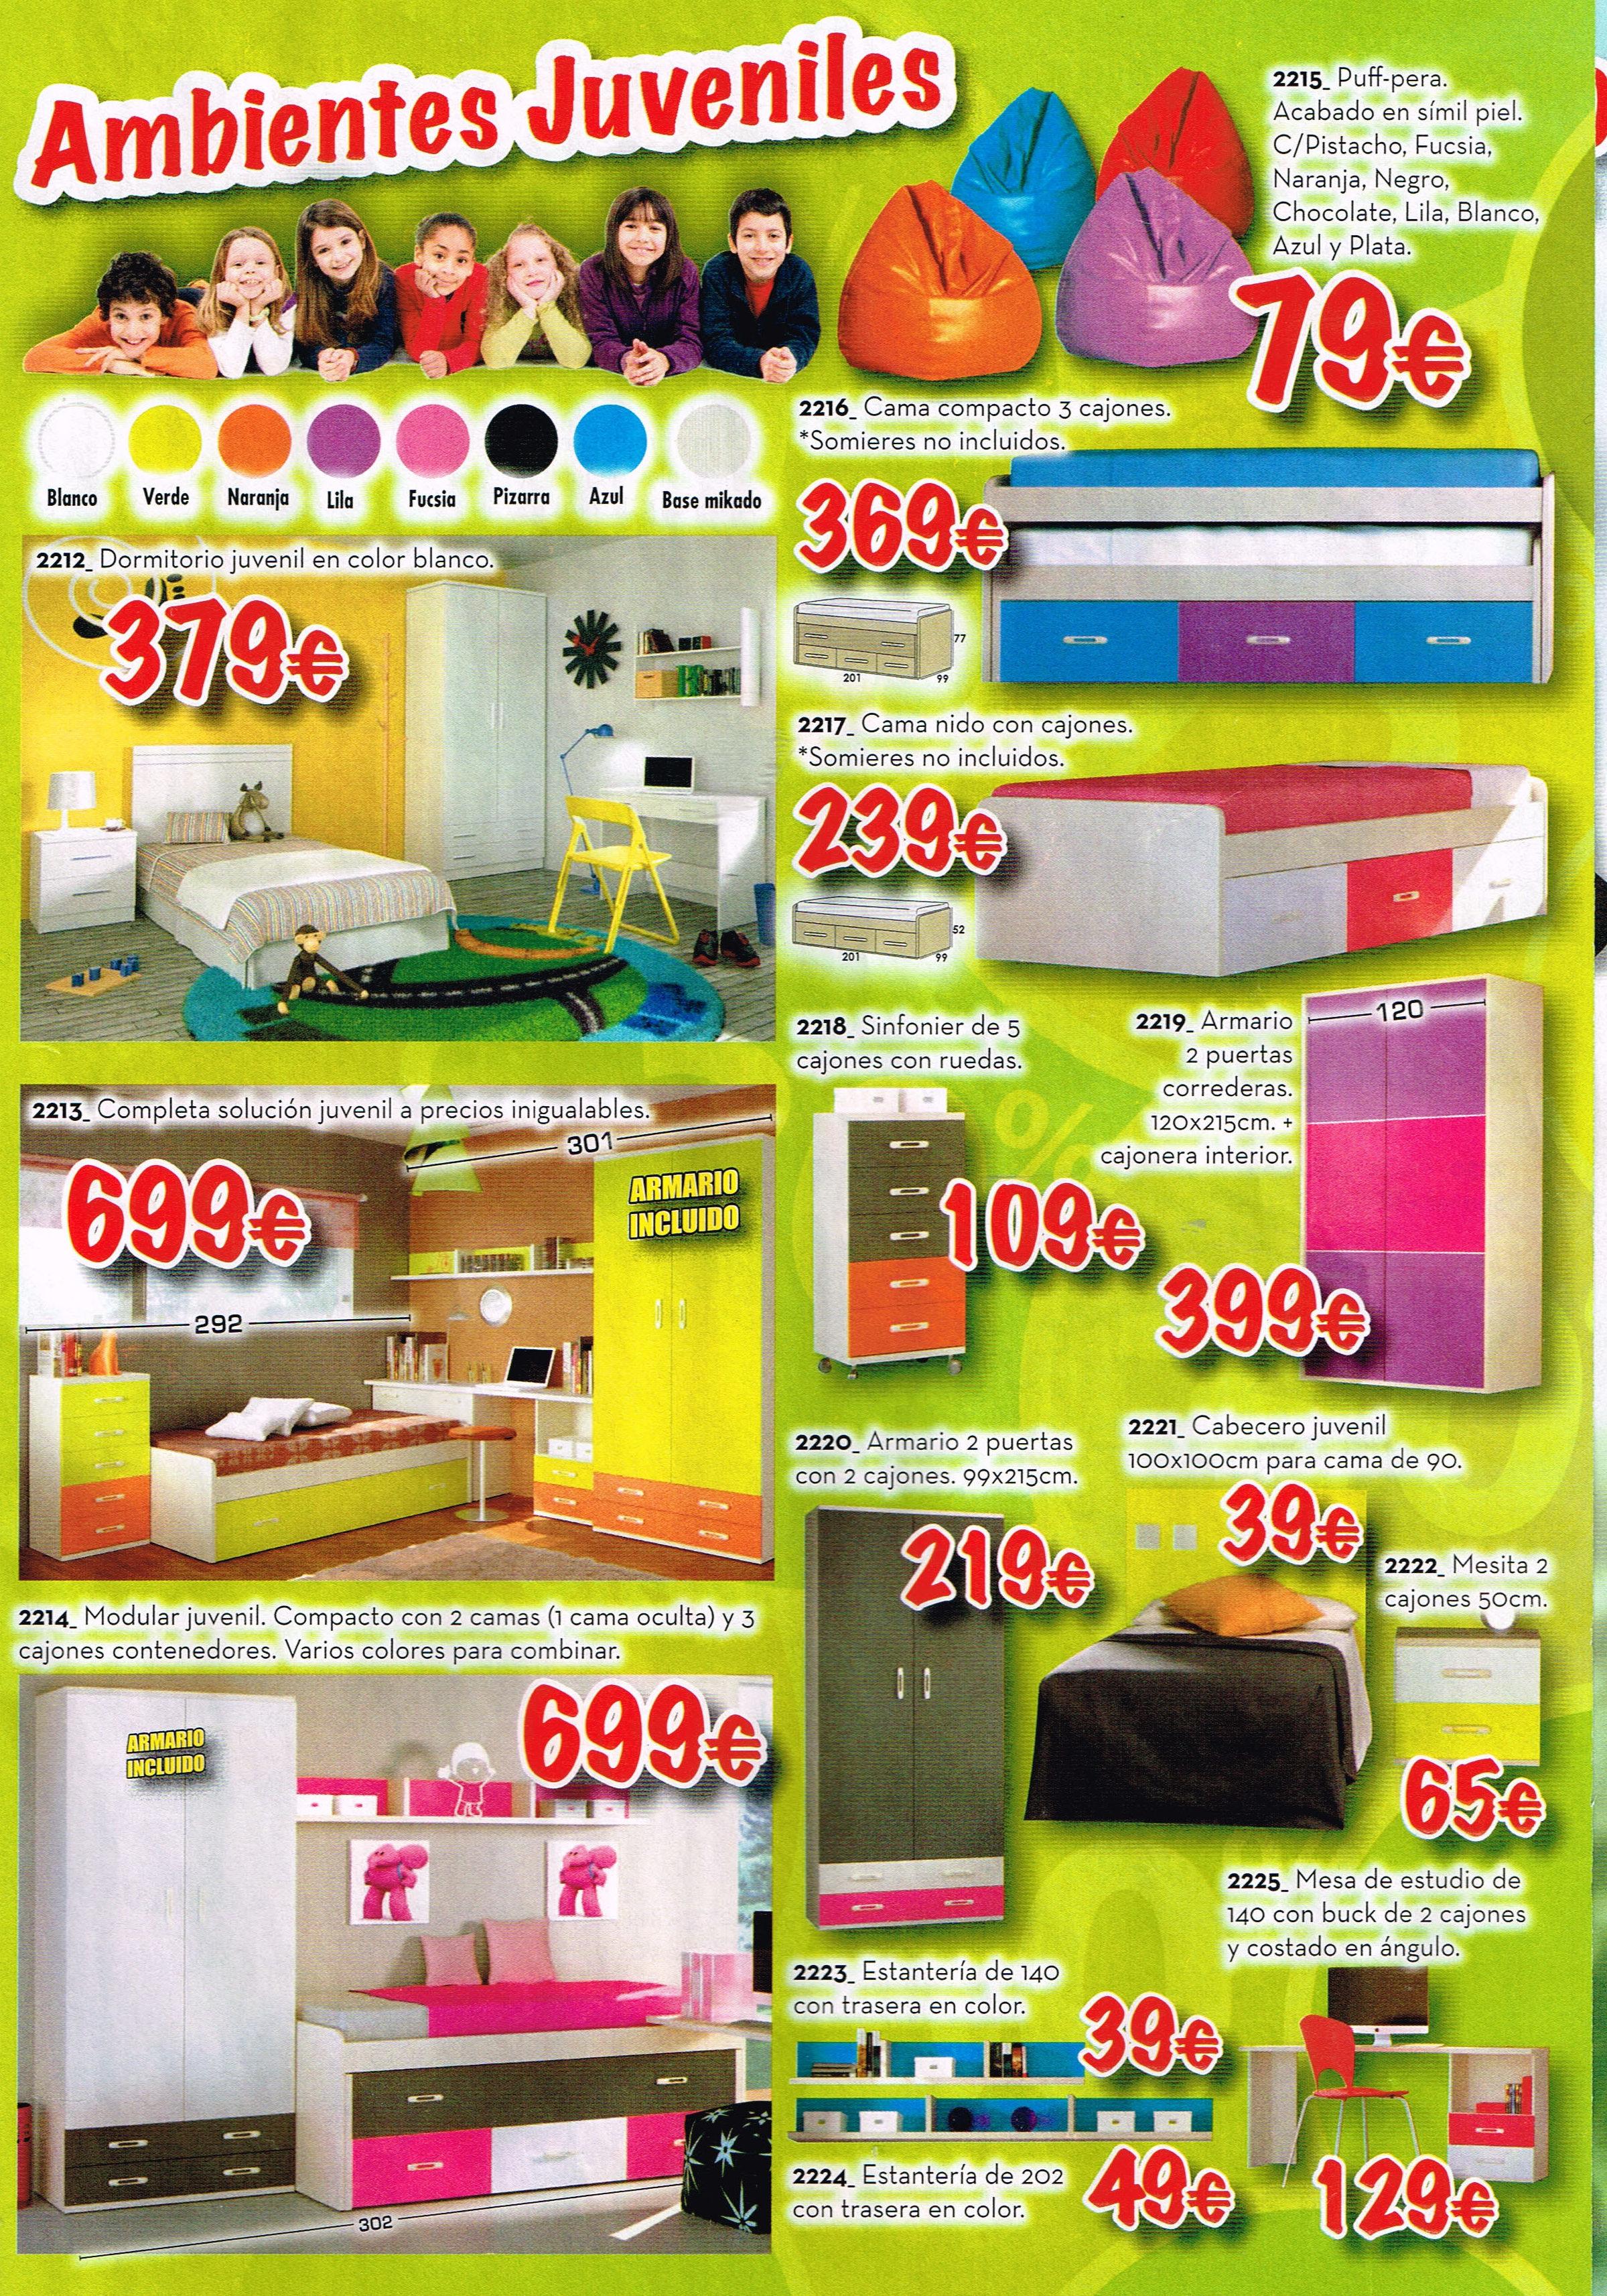 Catalogo de ofertas catalogo de muebles de muebles contrastes for Ofertas de zapateros